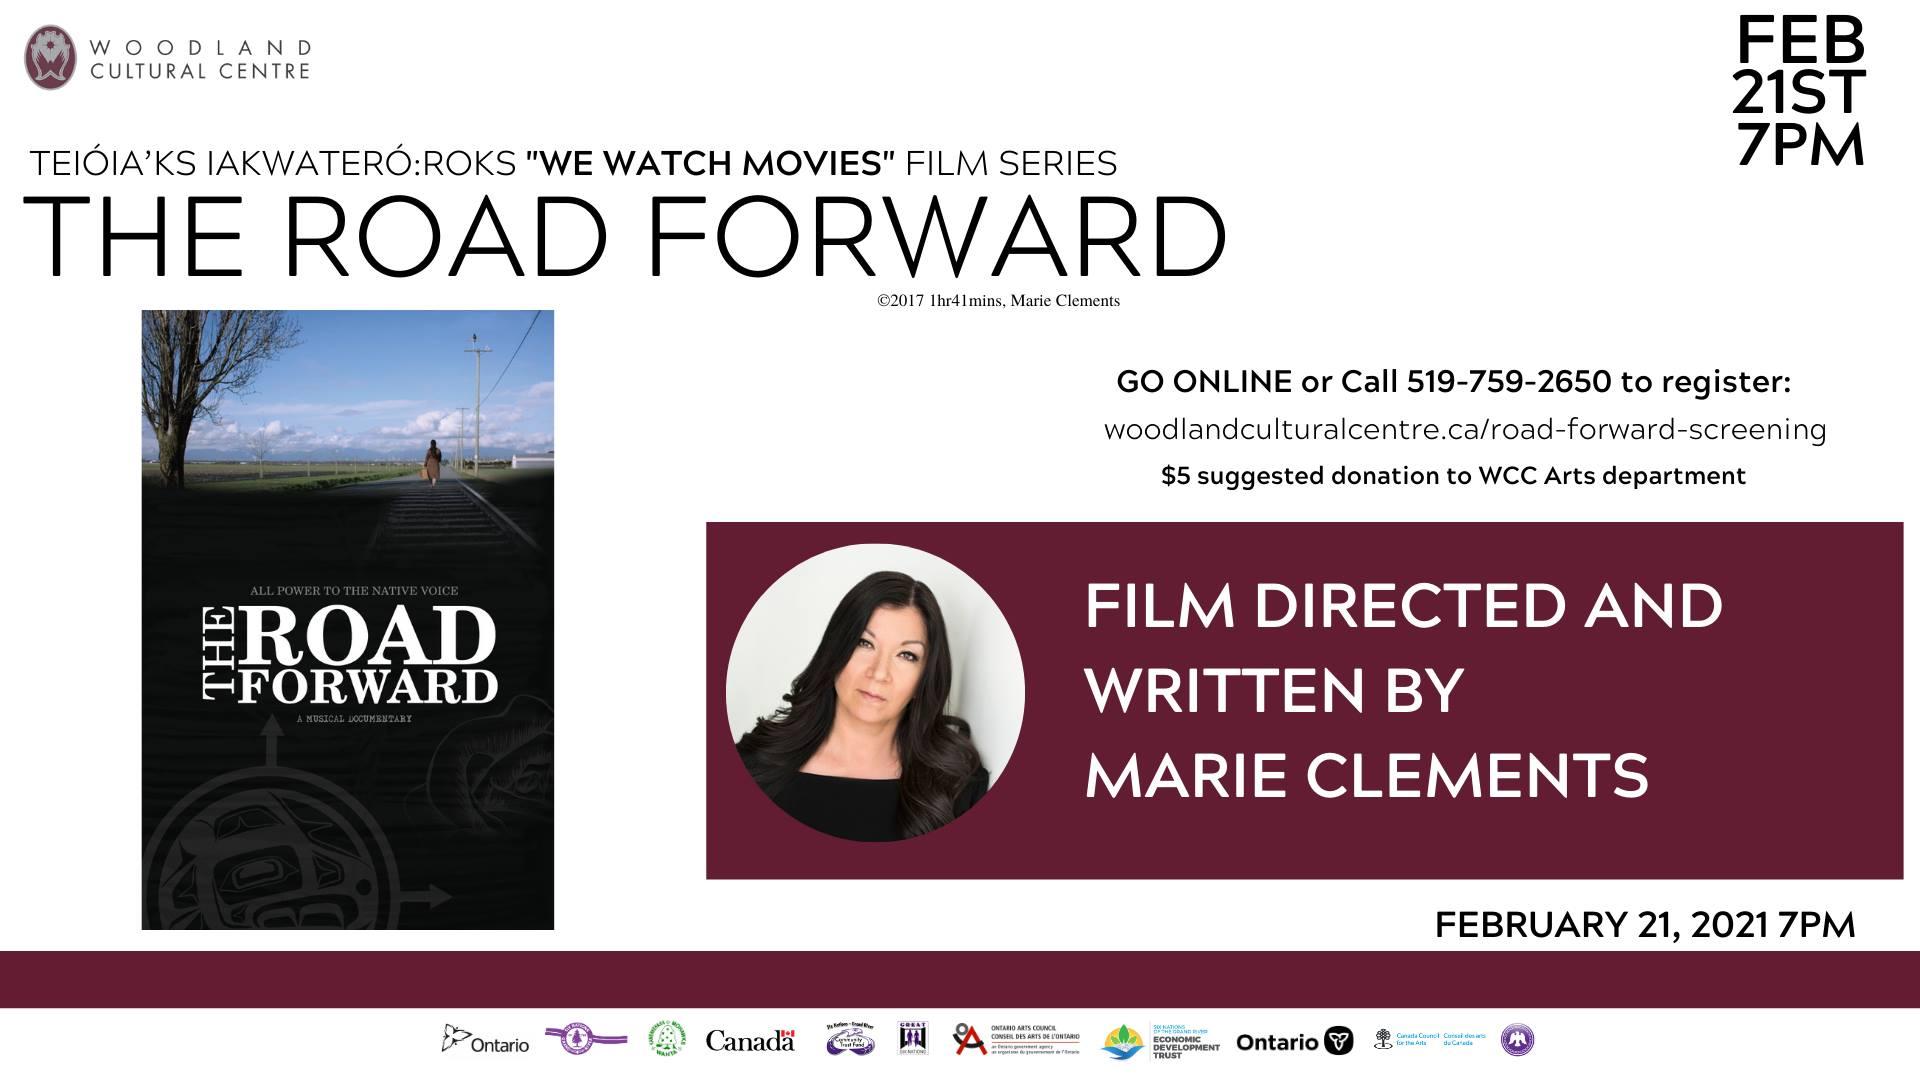 """The Road Forward"" Teioia'ks iakwatero:roks ""We Watch Movies"" Film Series"